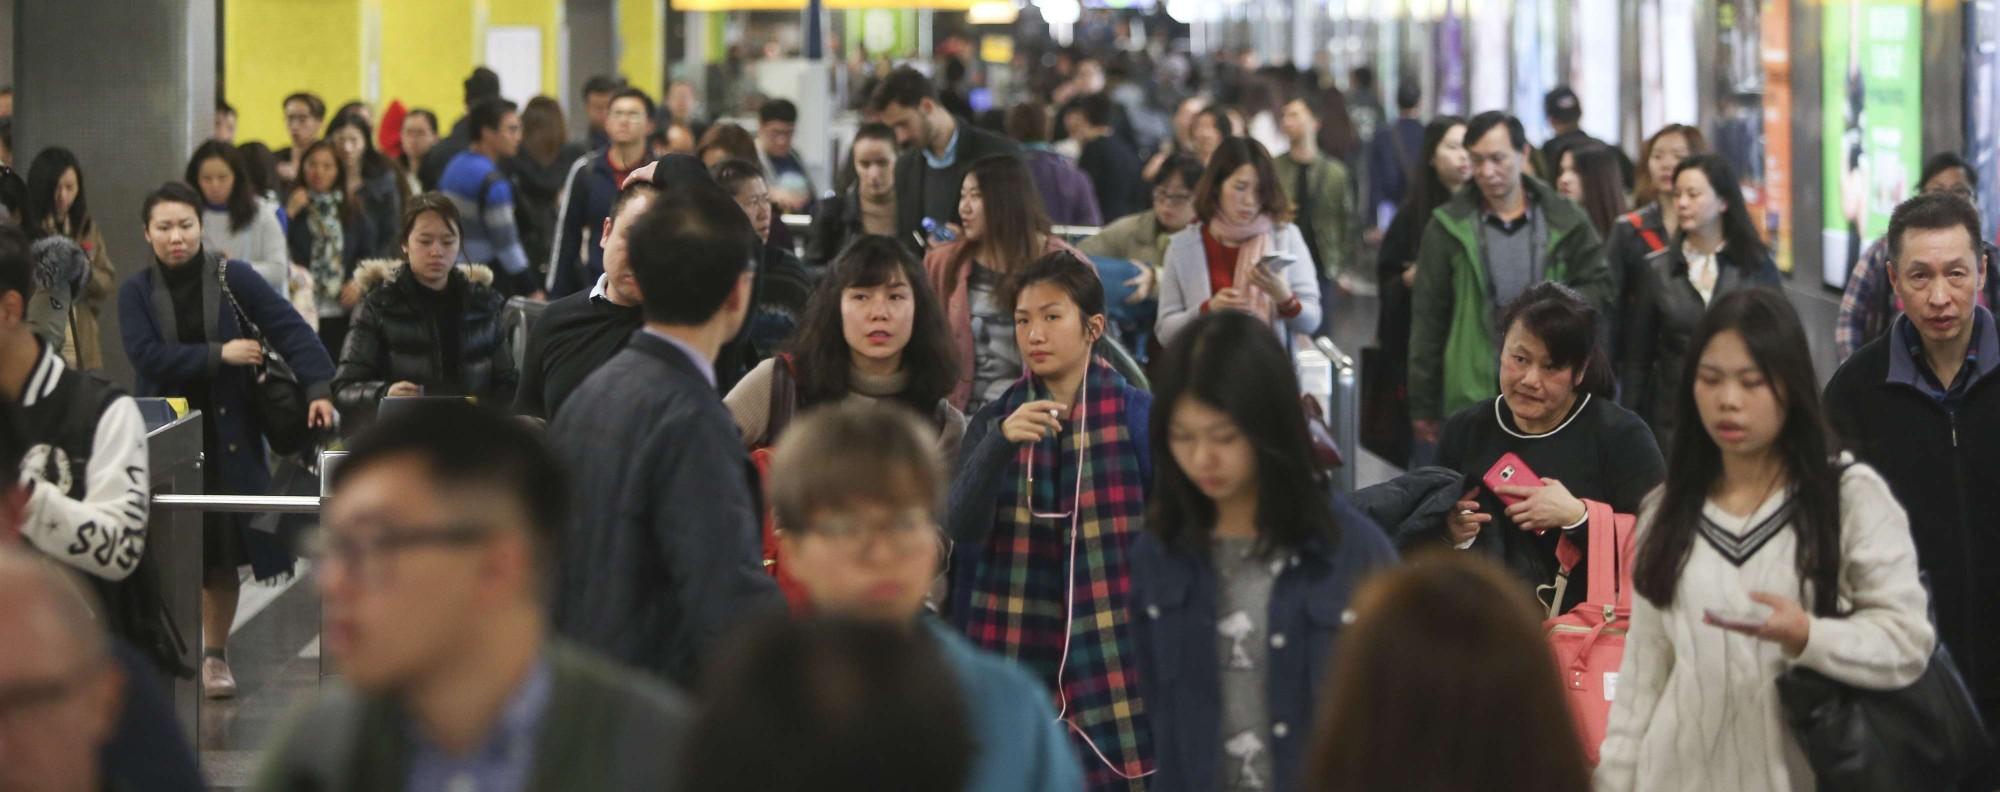 Passengers at Tsim Sha Tsui MTR Station. Photo: Sam Tsang